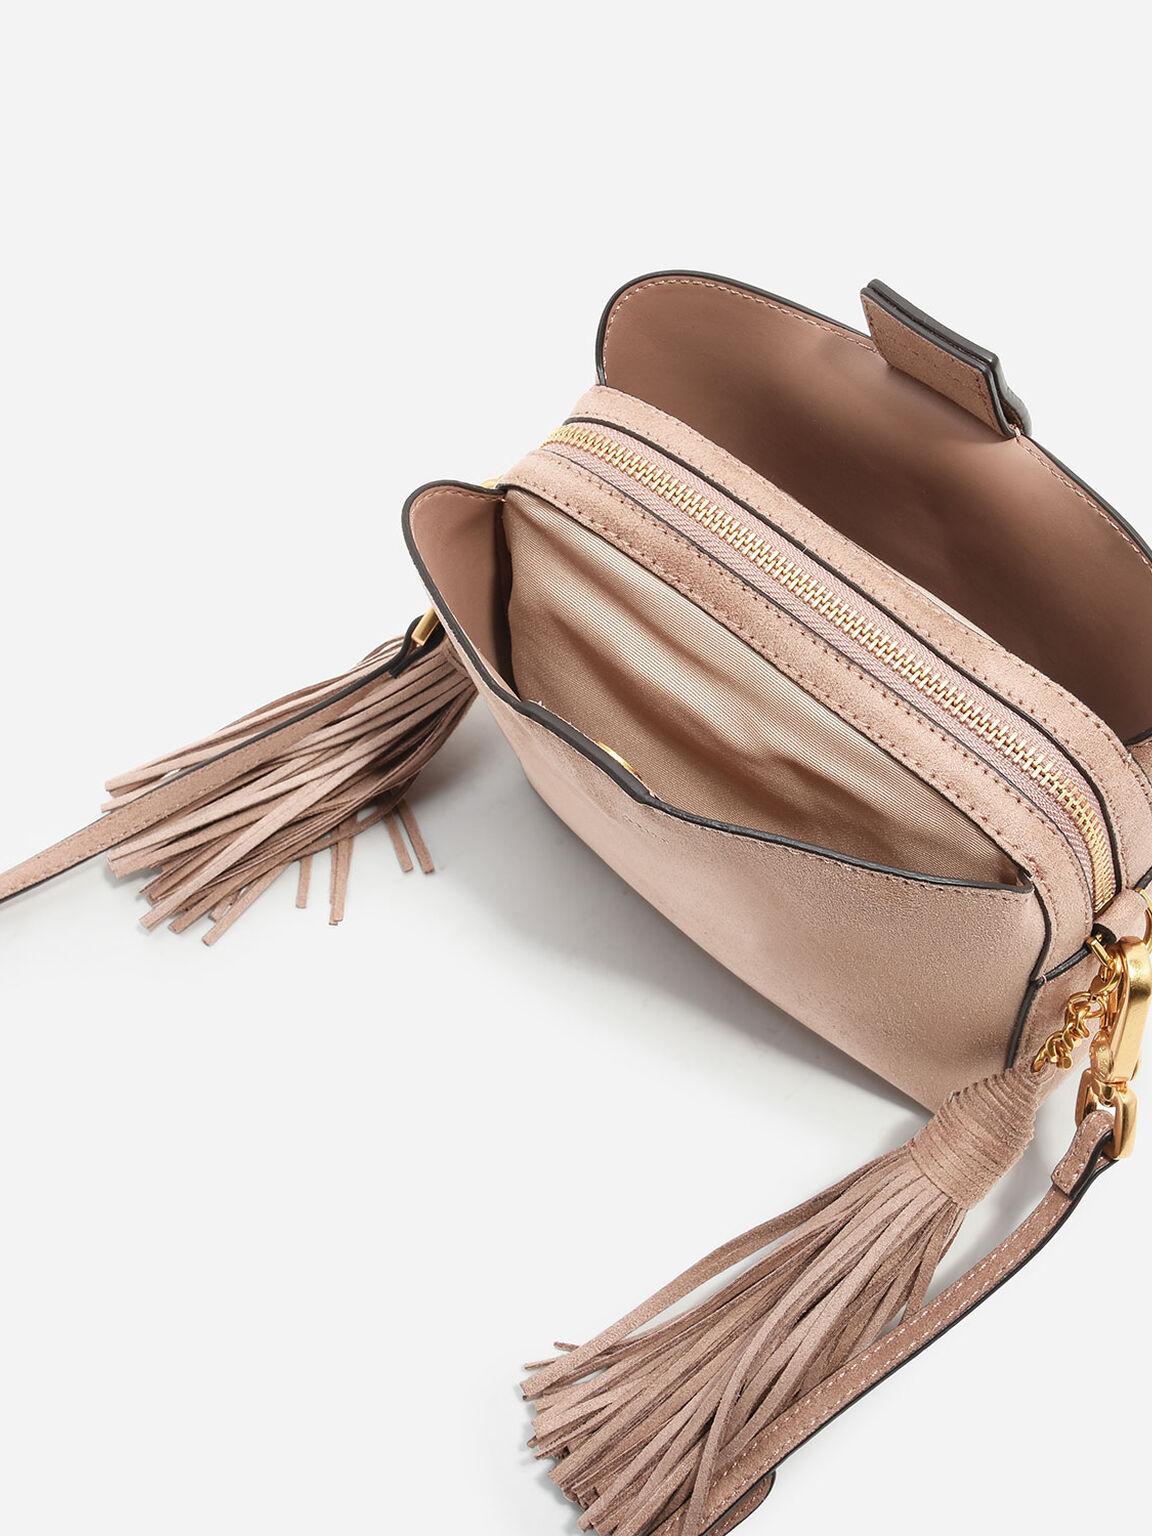 Tassel-Detail Sling Bag, Nude, hi-res